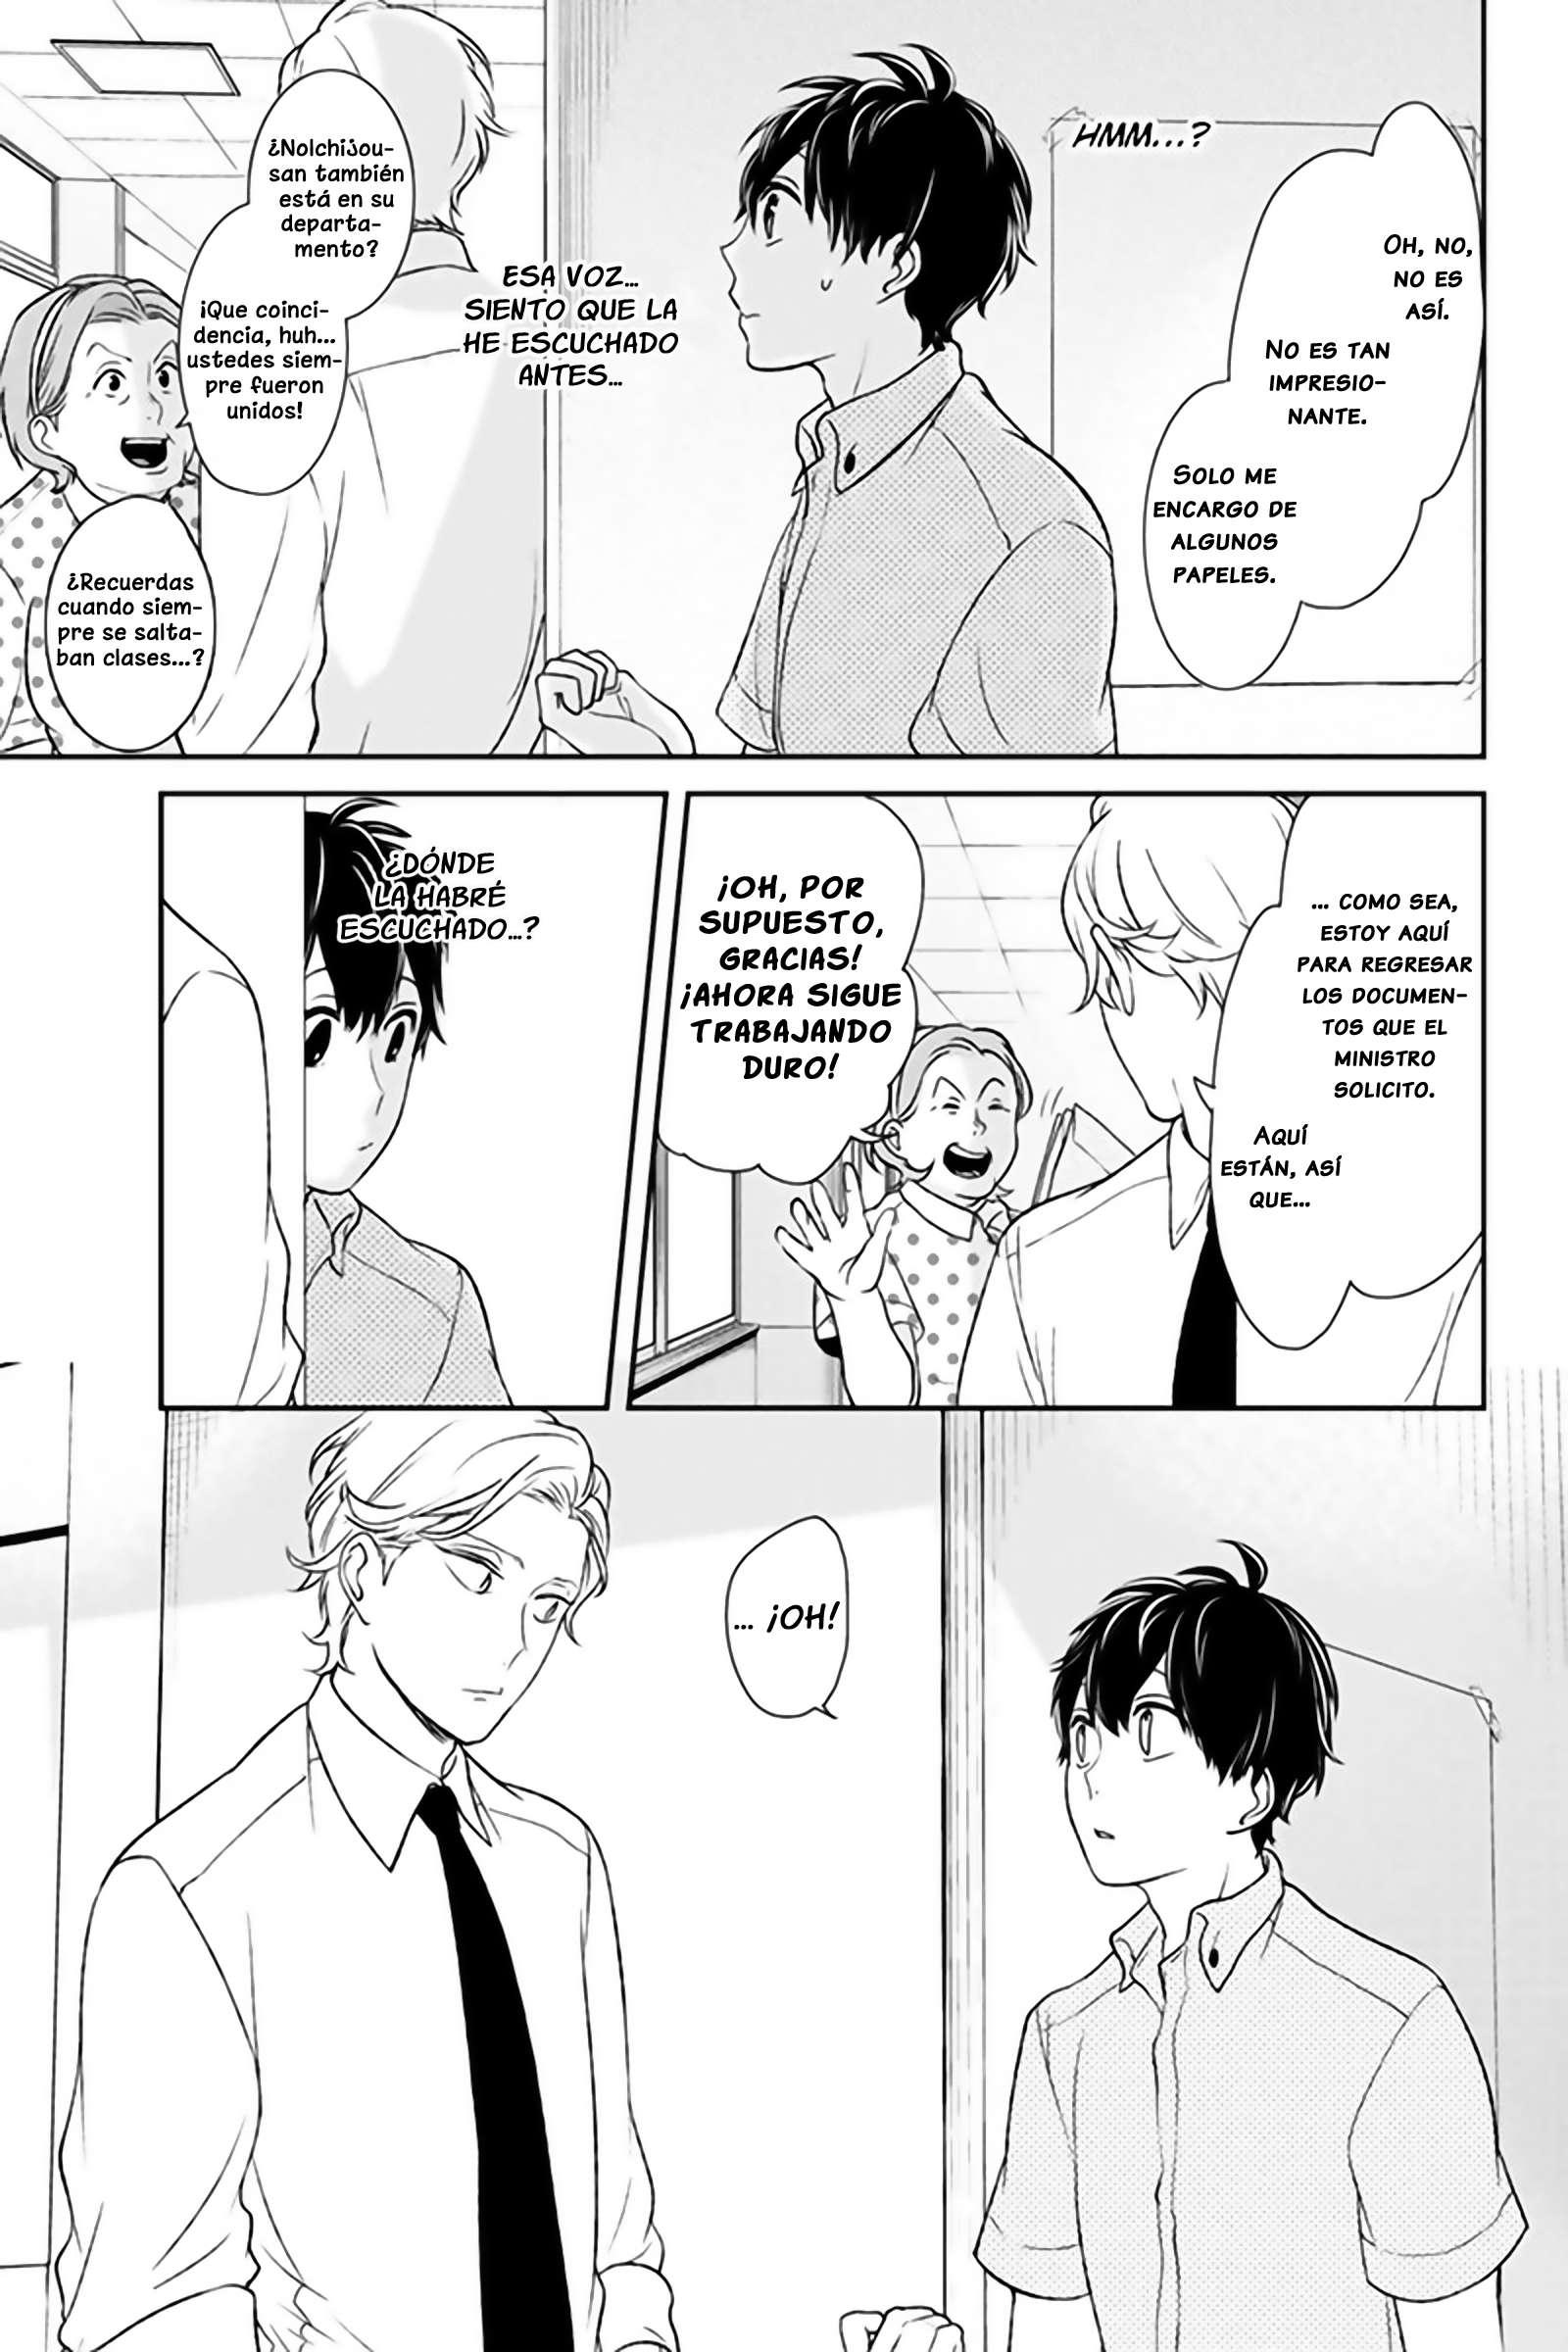 http://c5.ninemanga.com/es_manga/14/14734/423648/ac0baabba579f45a32714b0645135972.jpg Page 7